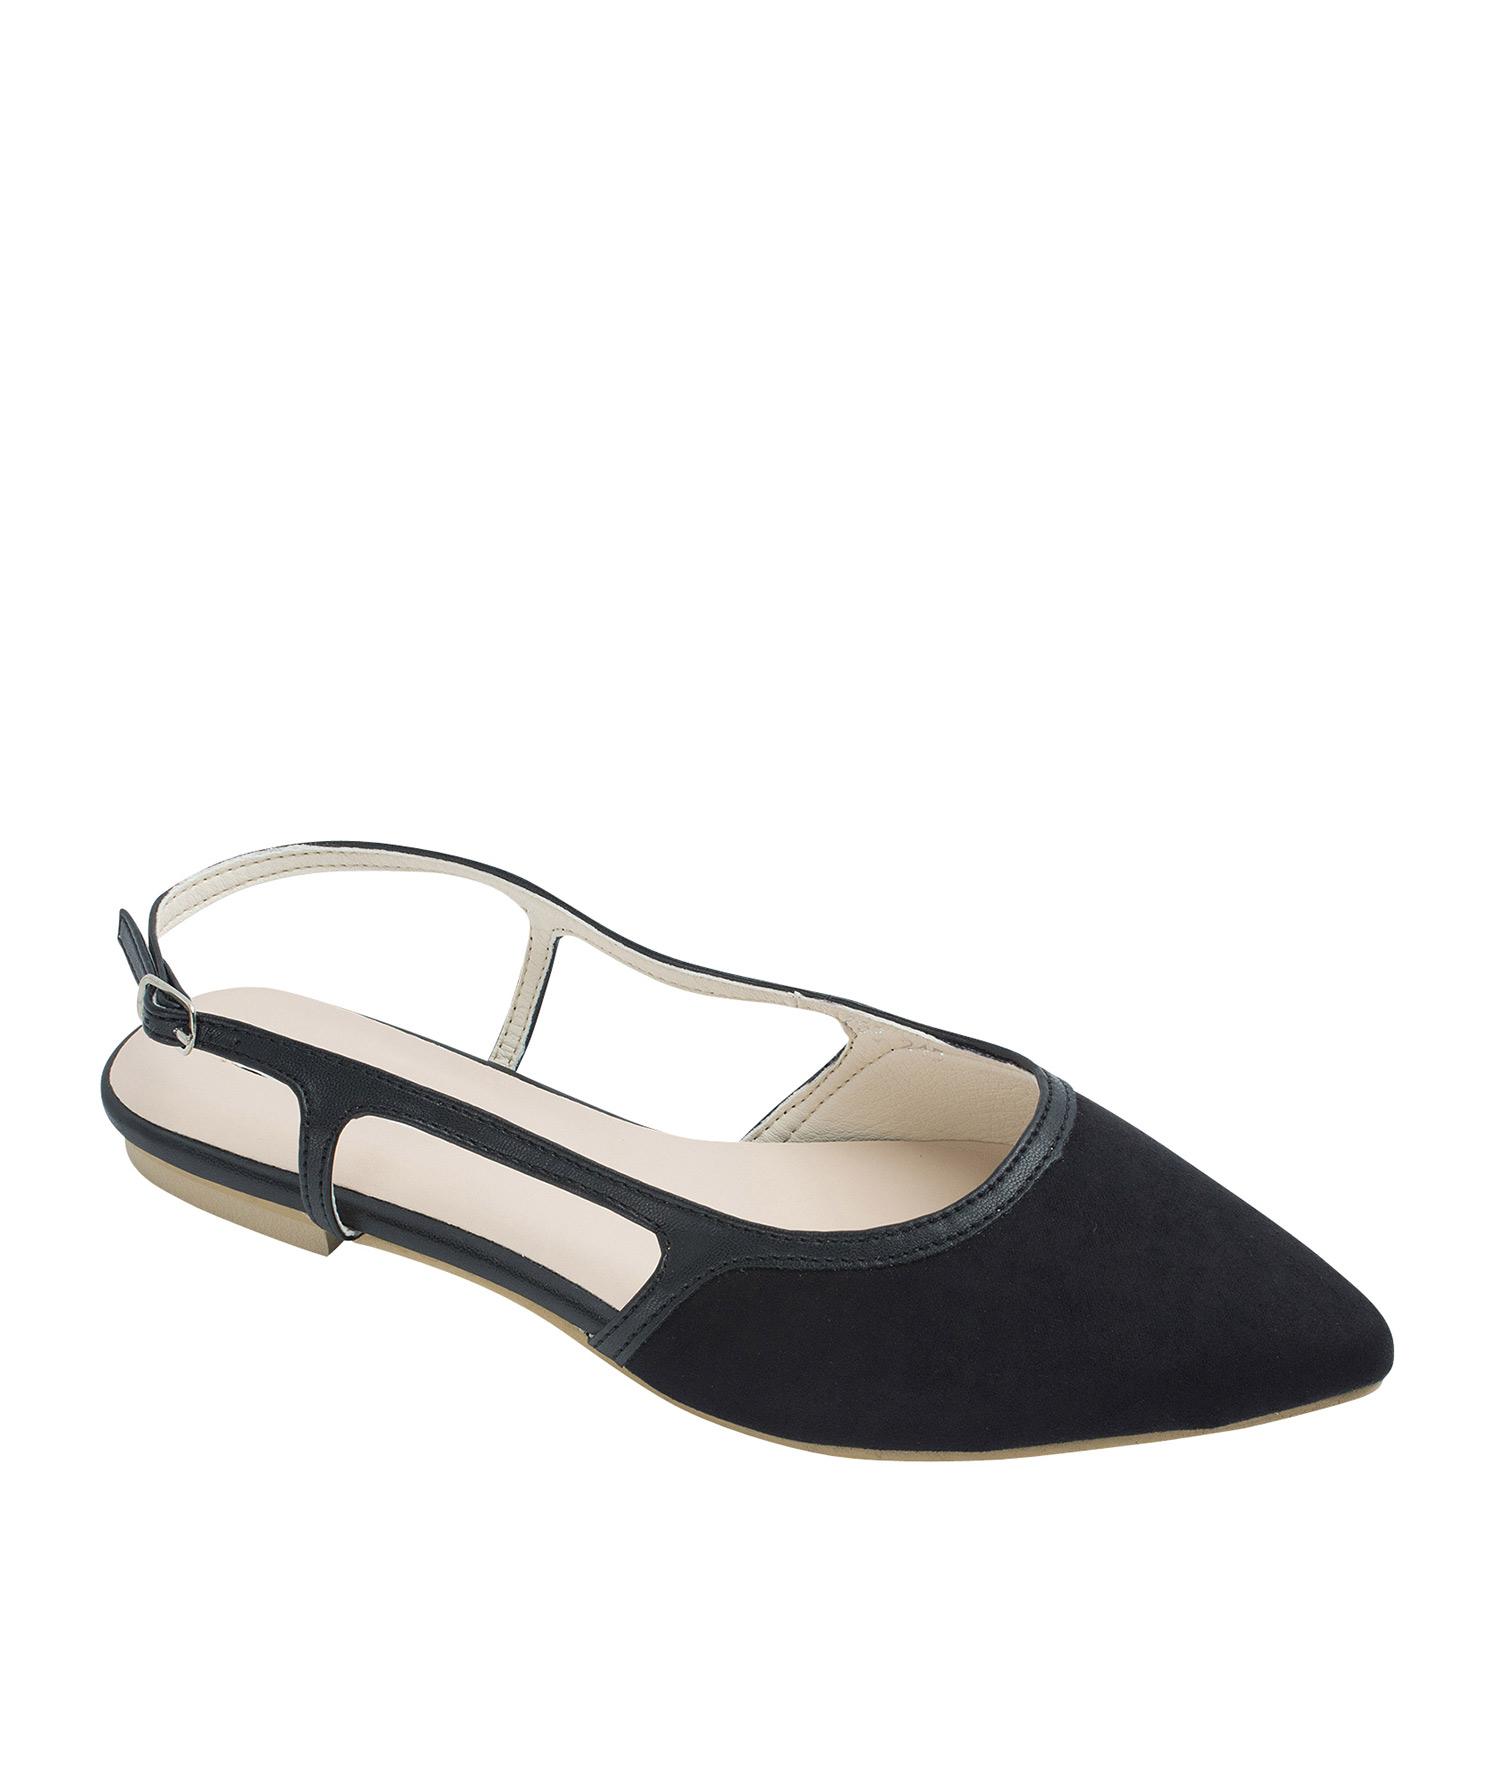 01329e6fb00 AnnaKastle Womens Faux Suede Pointed Toe Slingback Flats Black